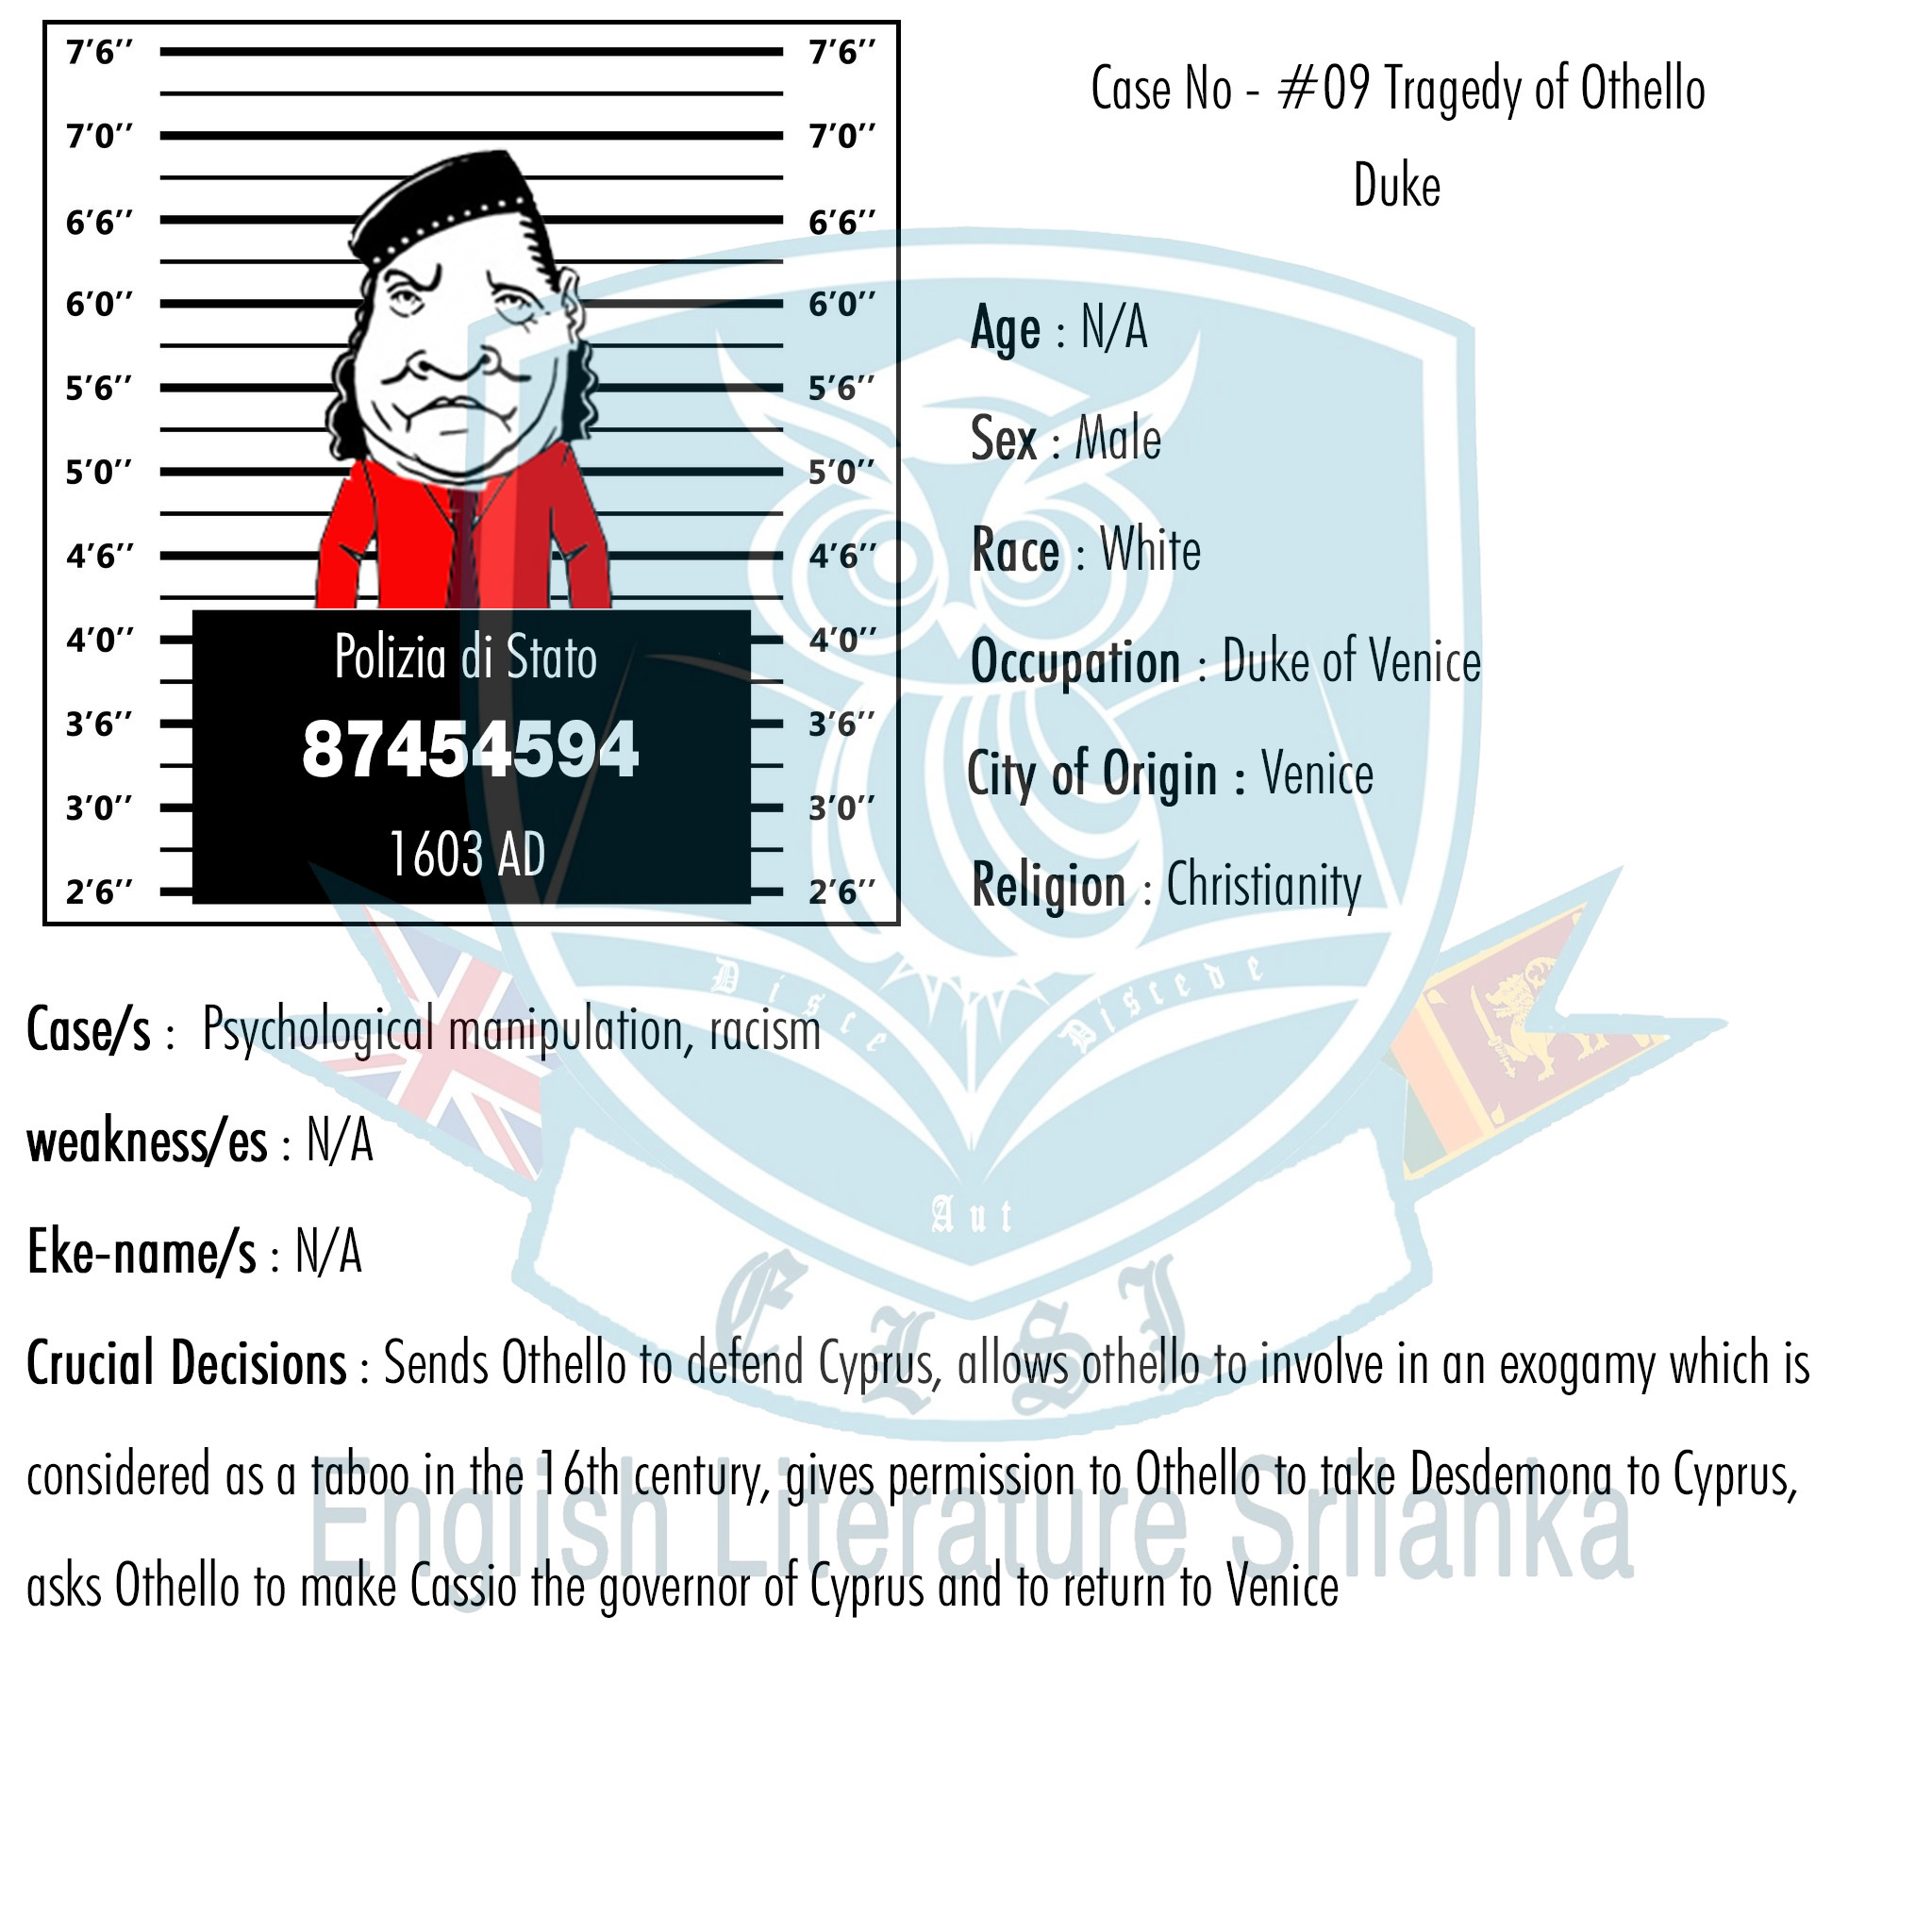 ELSL-Duke character summary